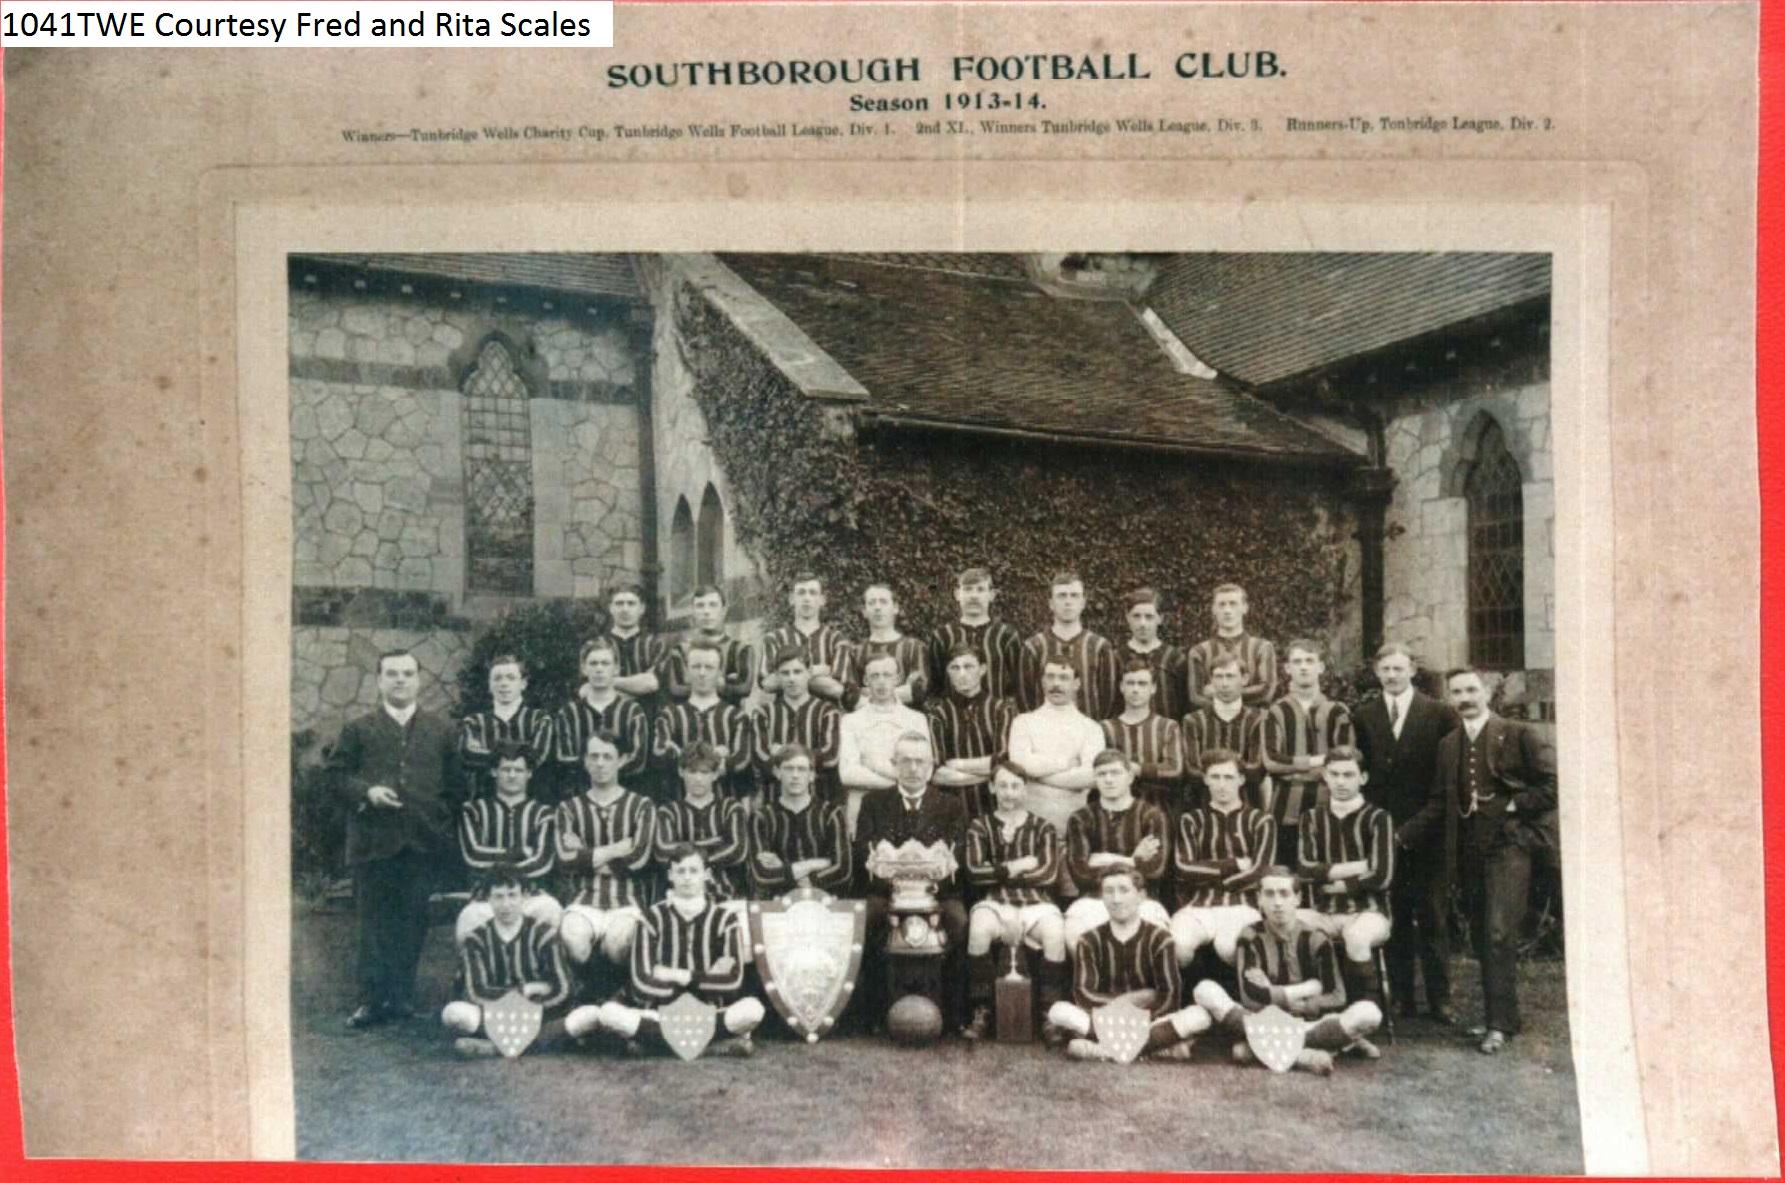 Southborough Football Club